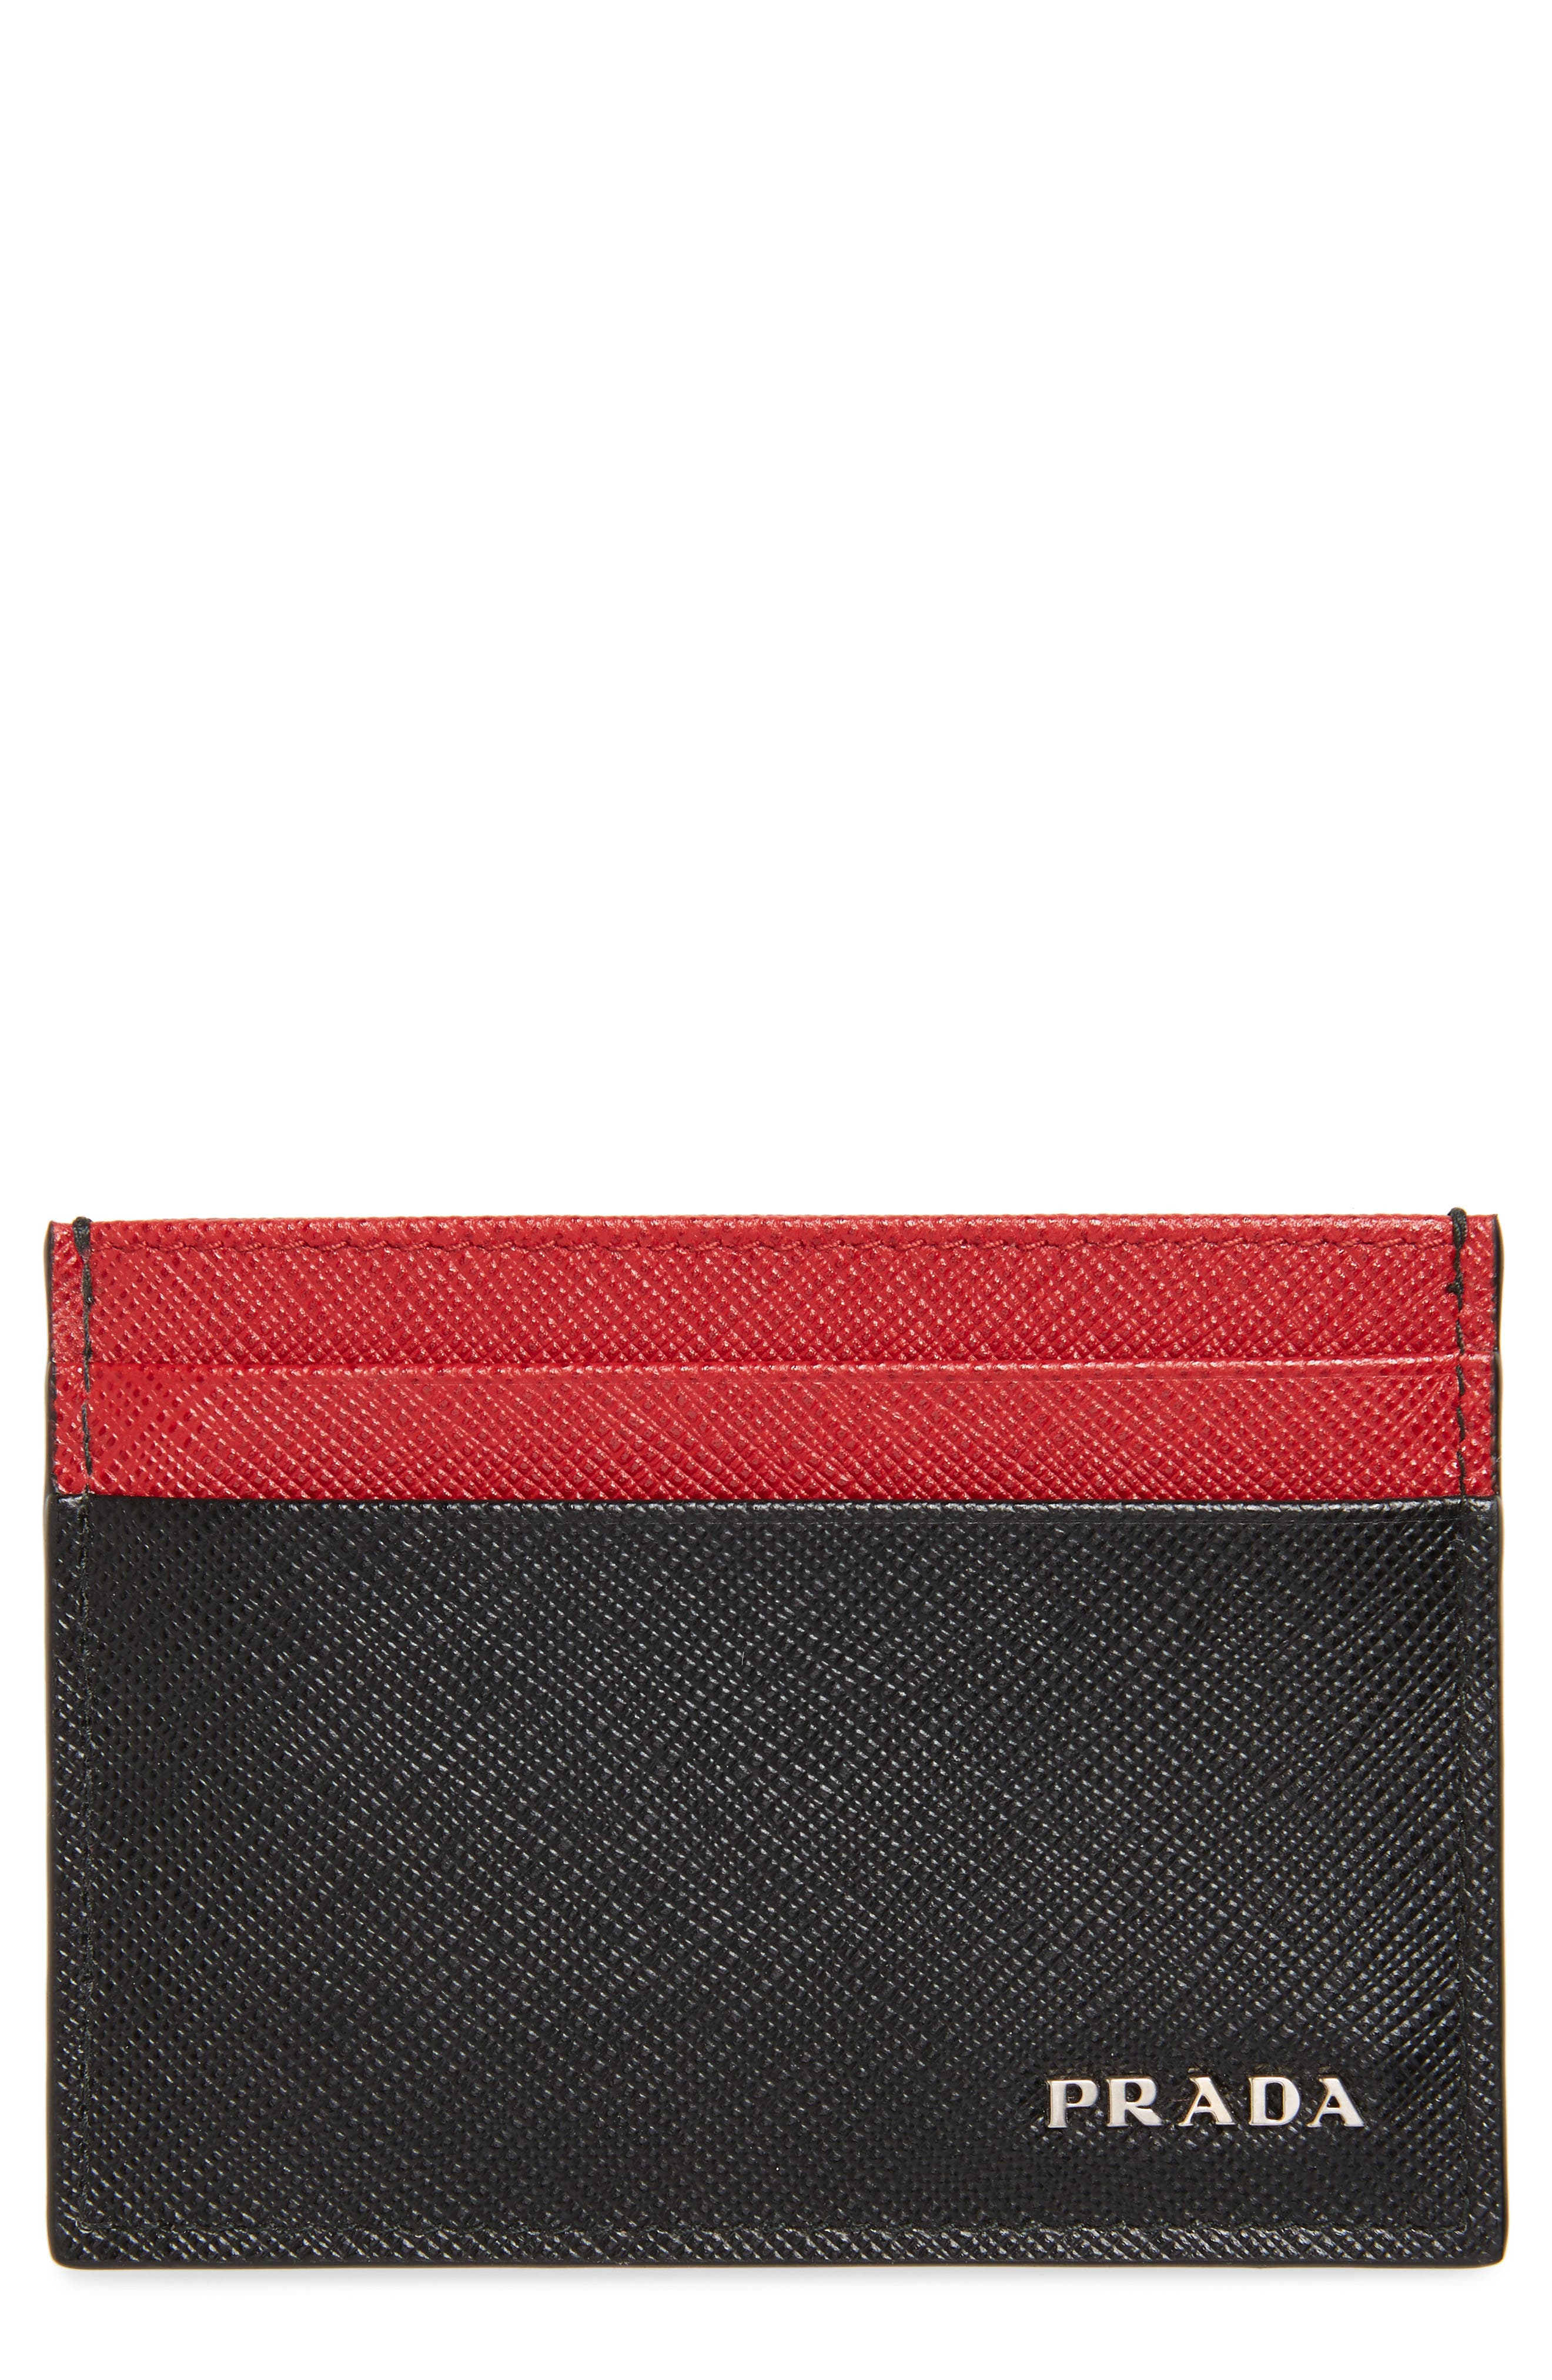 Bicolor Saffiano Leather Card Case,                         Main,                         color, BLACK/ RED